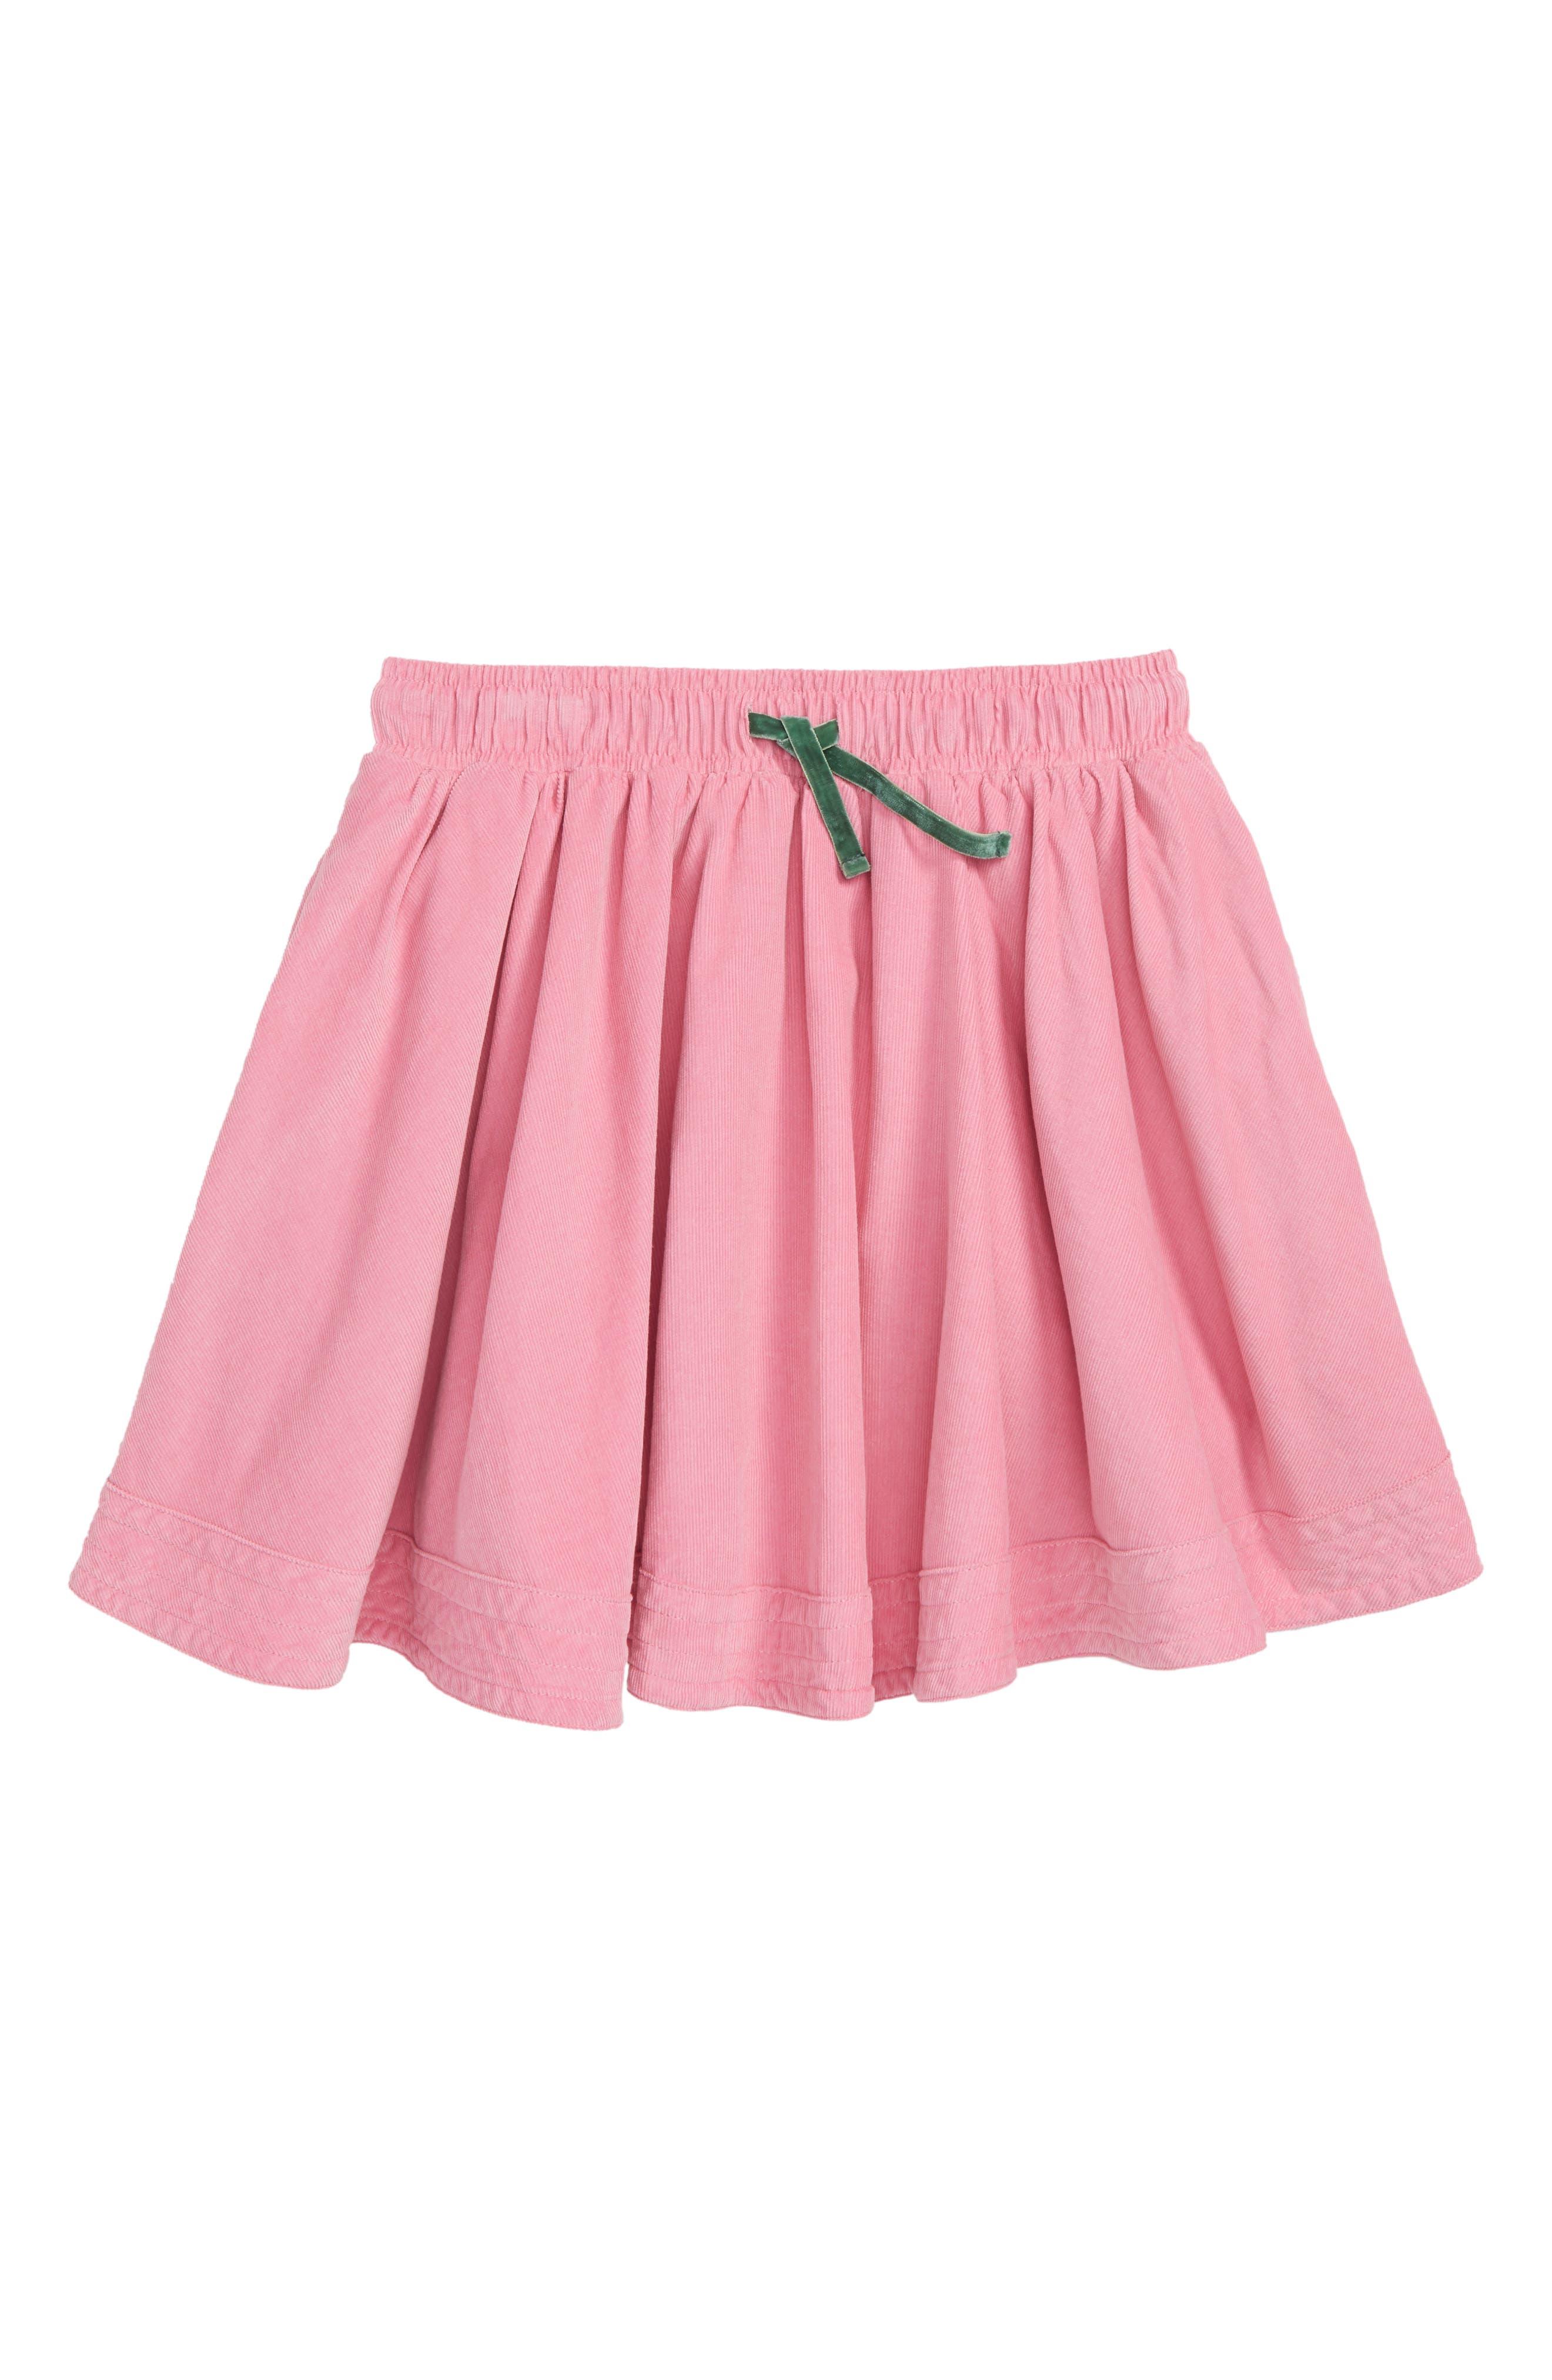 Simple Colorful Corduroy Skirt,                         Main,                         color, 664